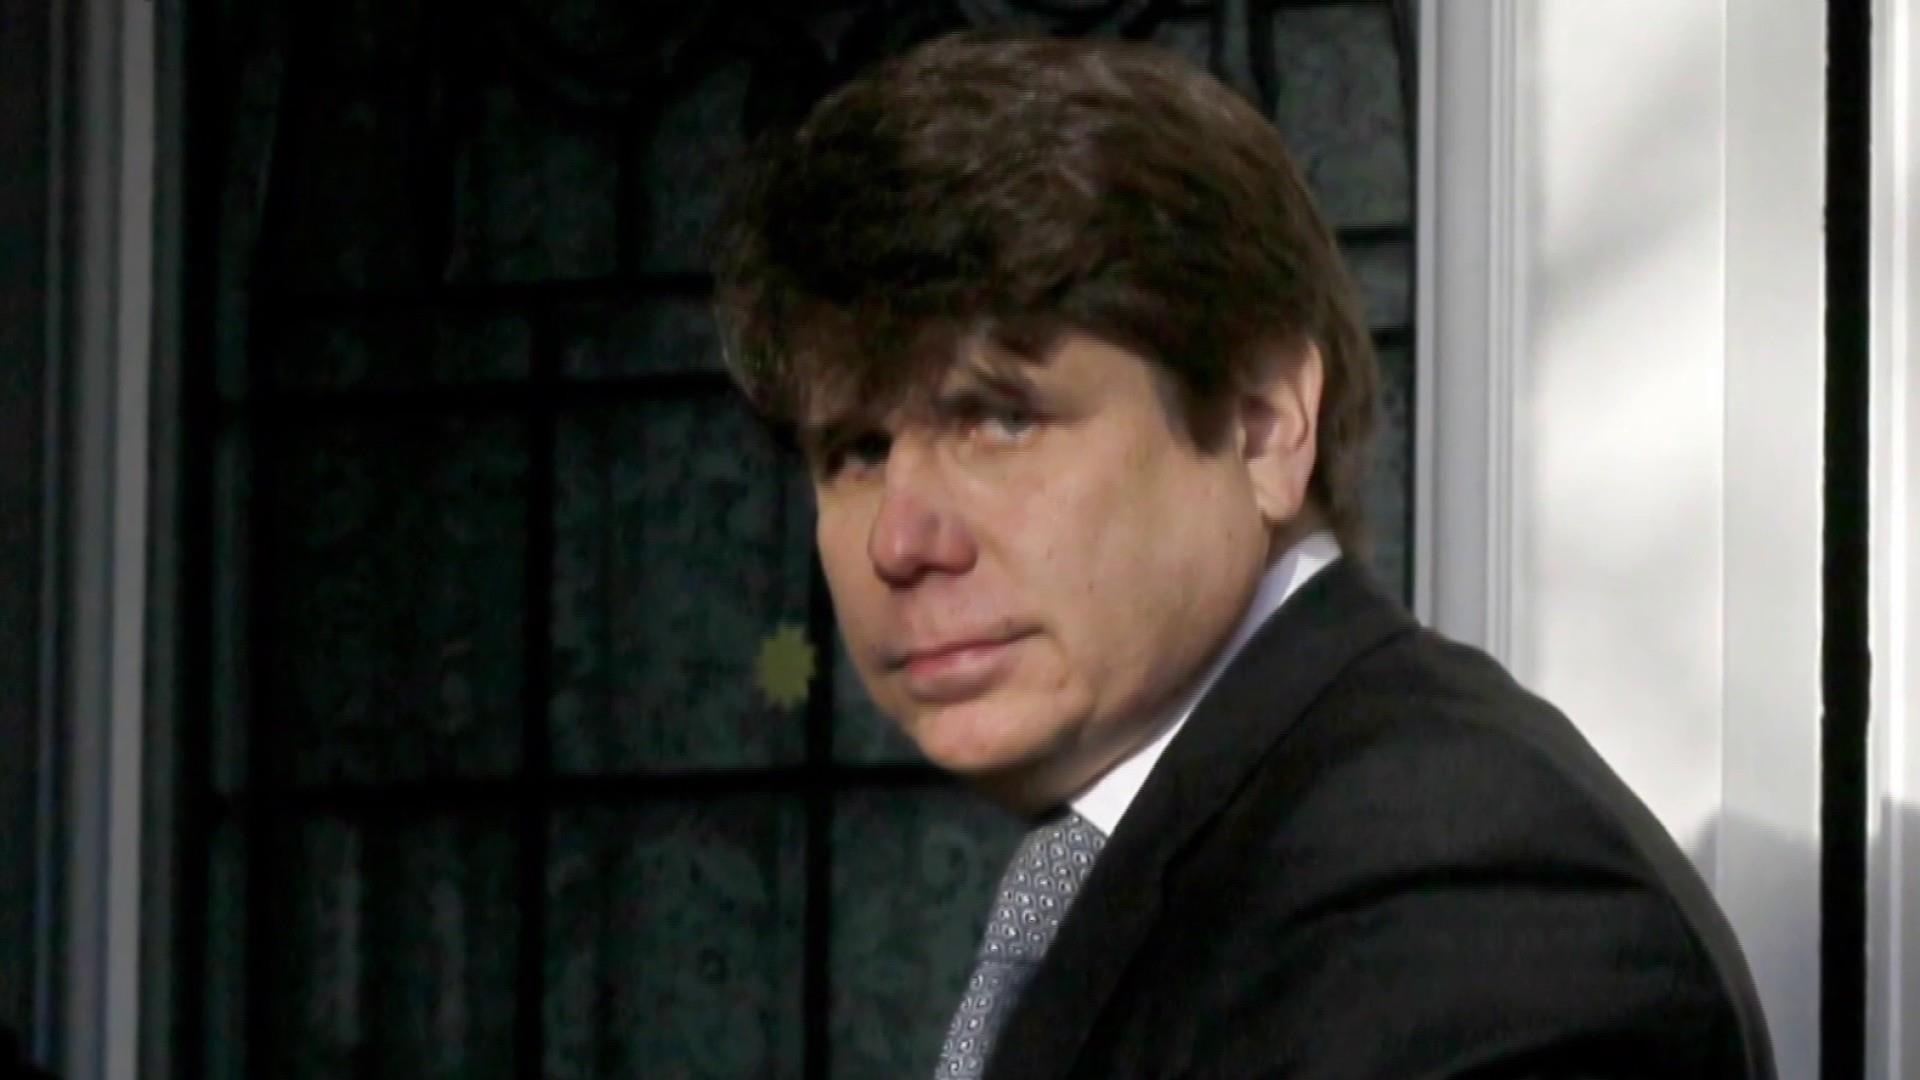 Will Trump commute Rod Blagojevich's sentence?